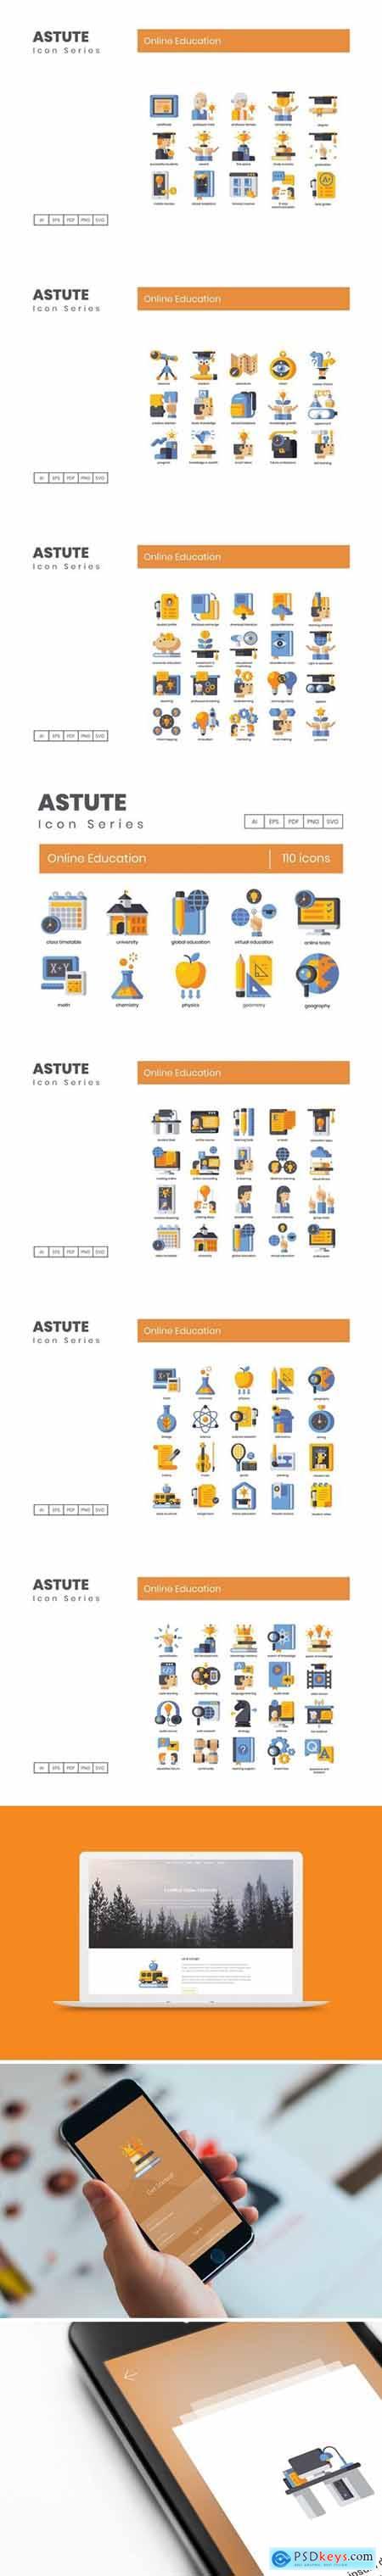 110 Online Education - Astute Series